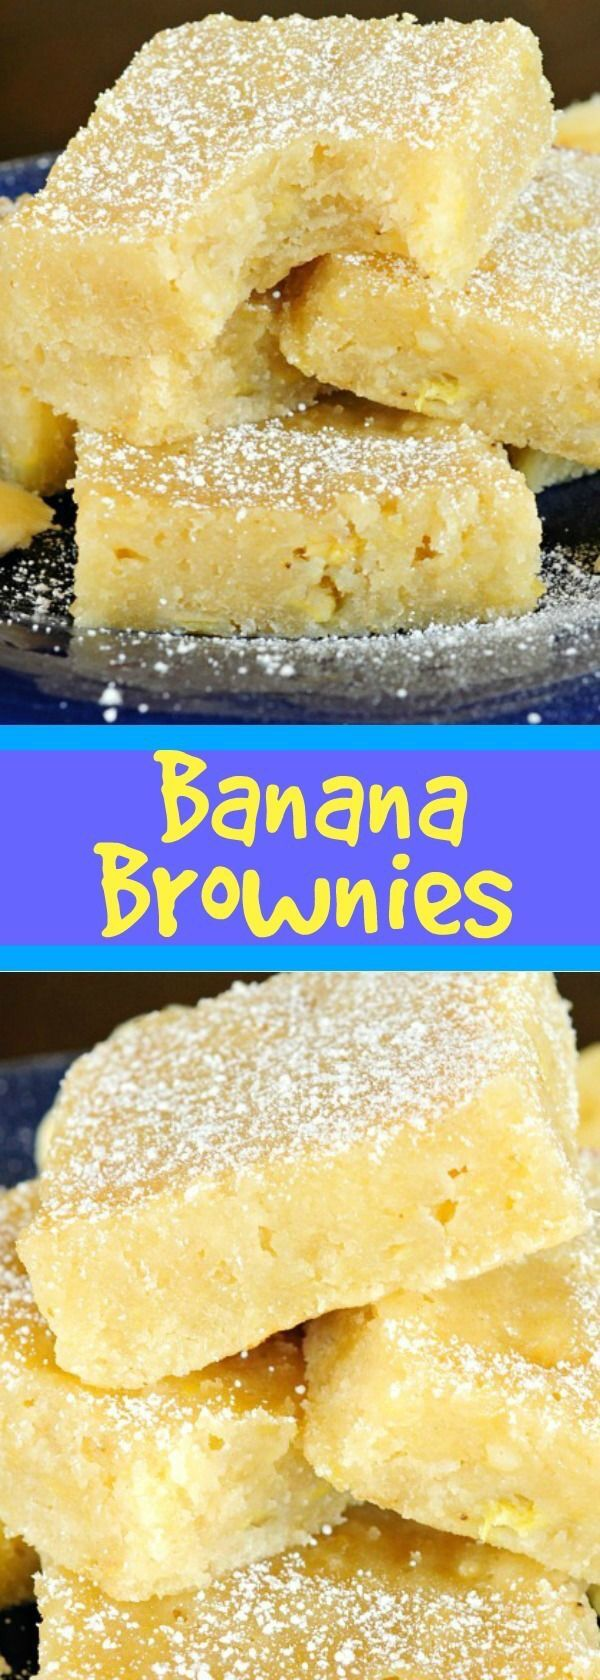 Top 22 ways to use up ripe Bananas: Food recipes